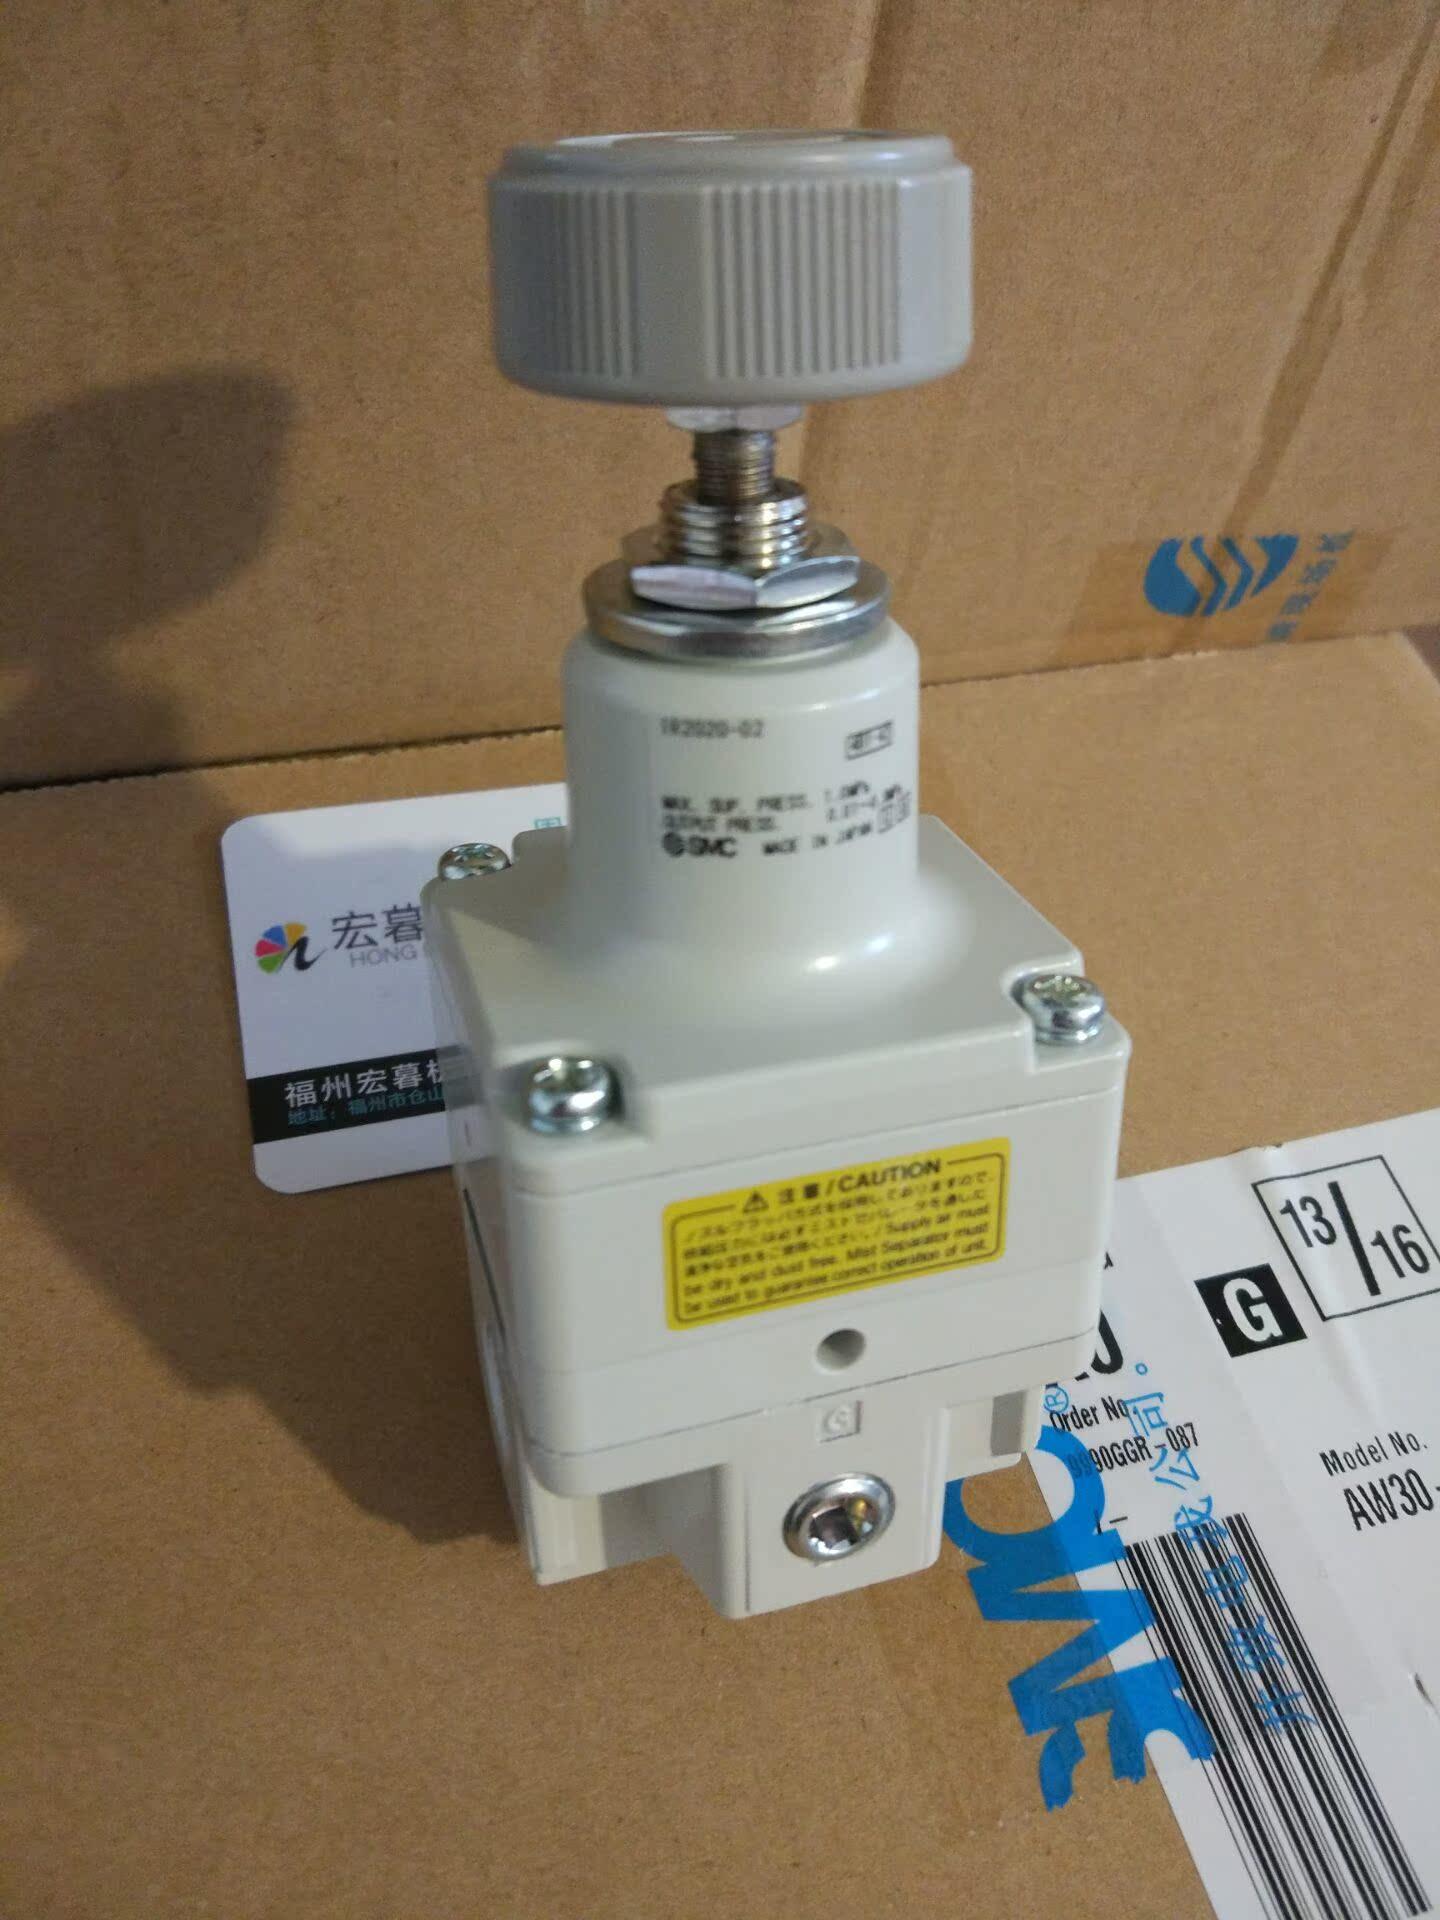 SMCIT2050-03比例バルブの規格品代購